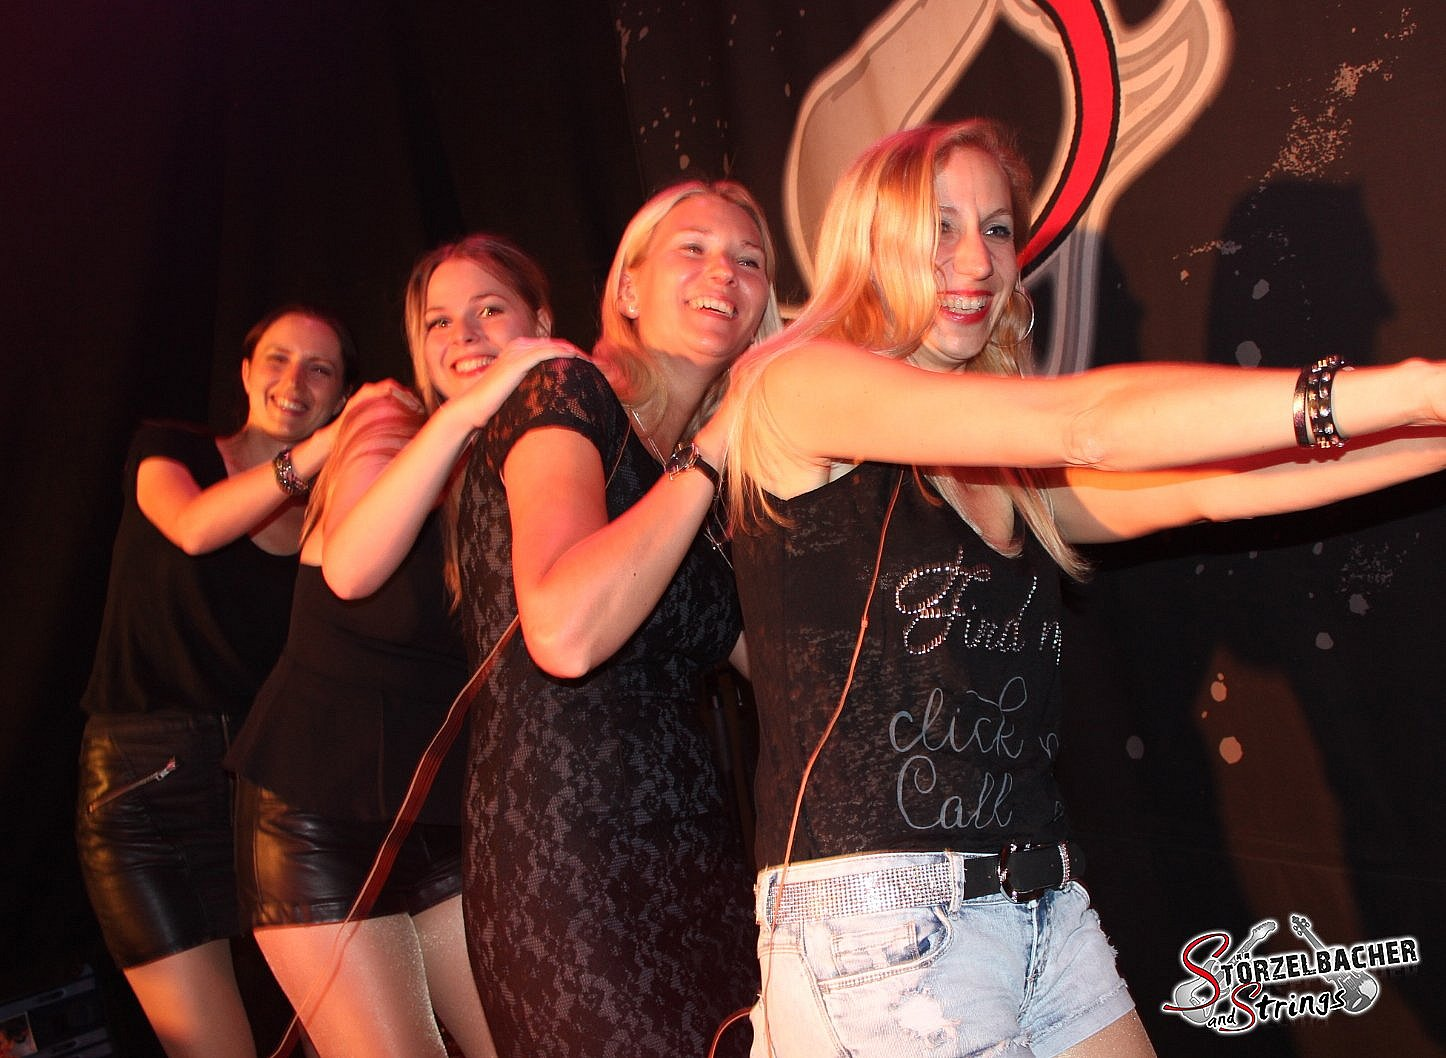 Single party bad kissingen Μακρησ βιβλιοπωλειο ροδοσ τηλεφωνο